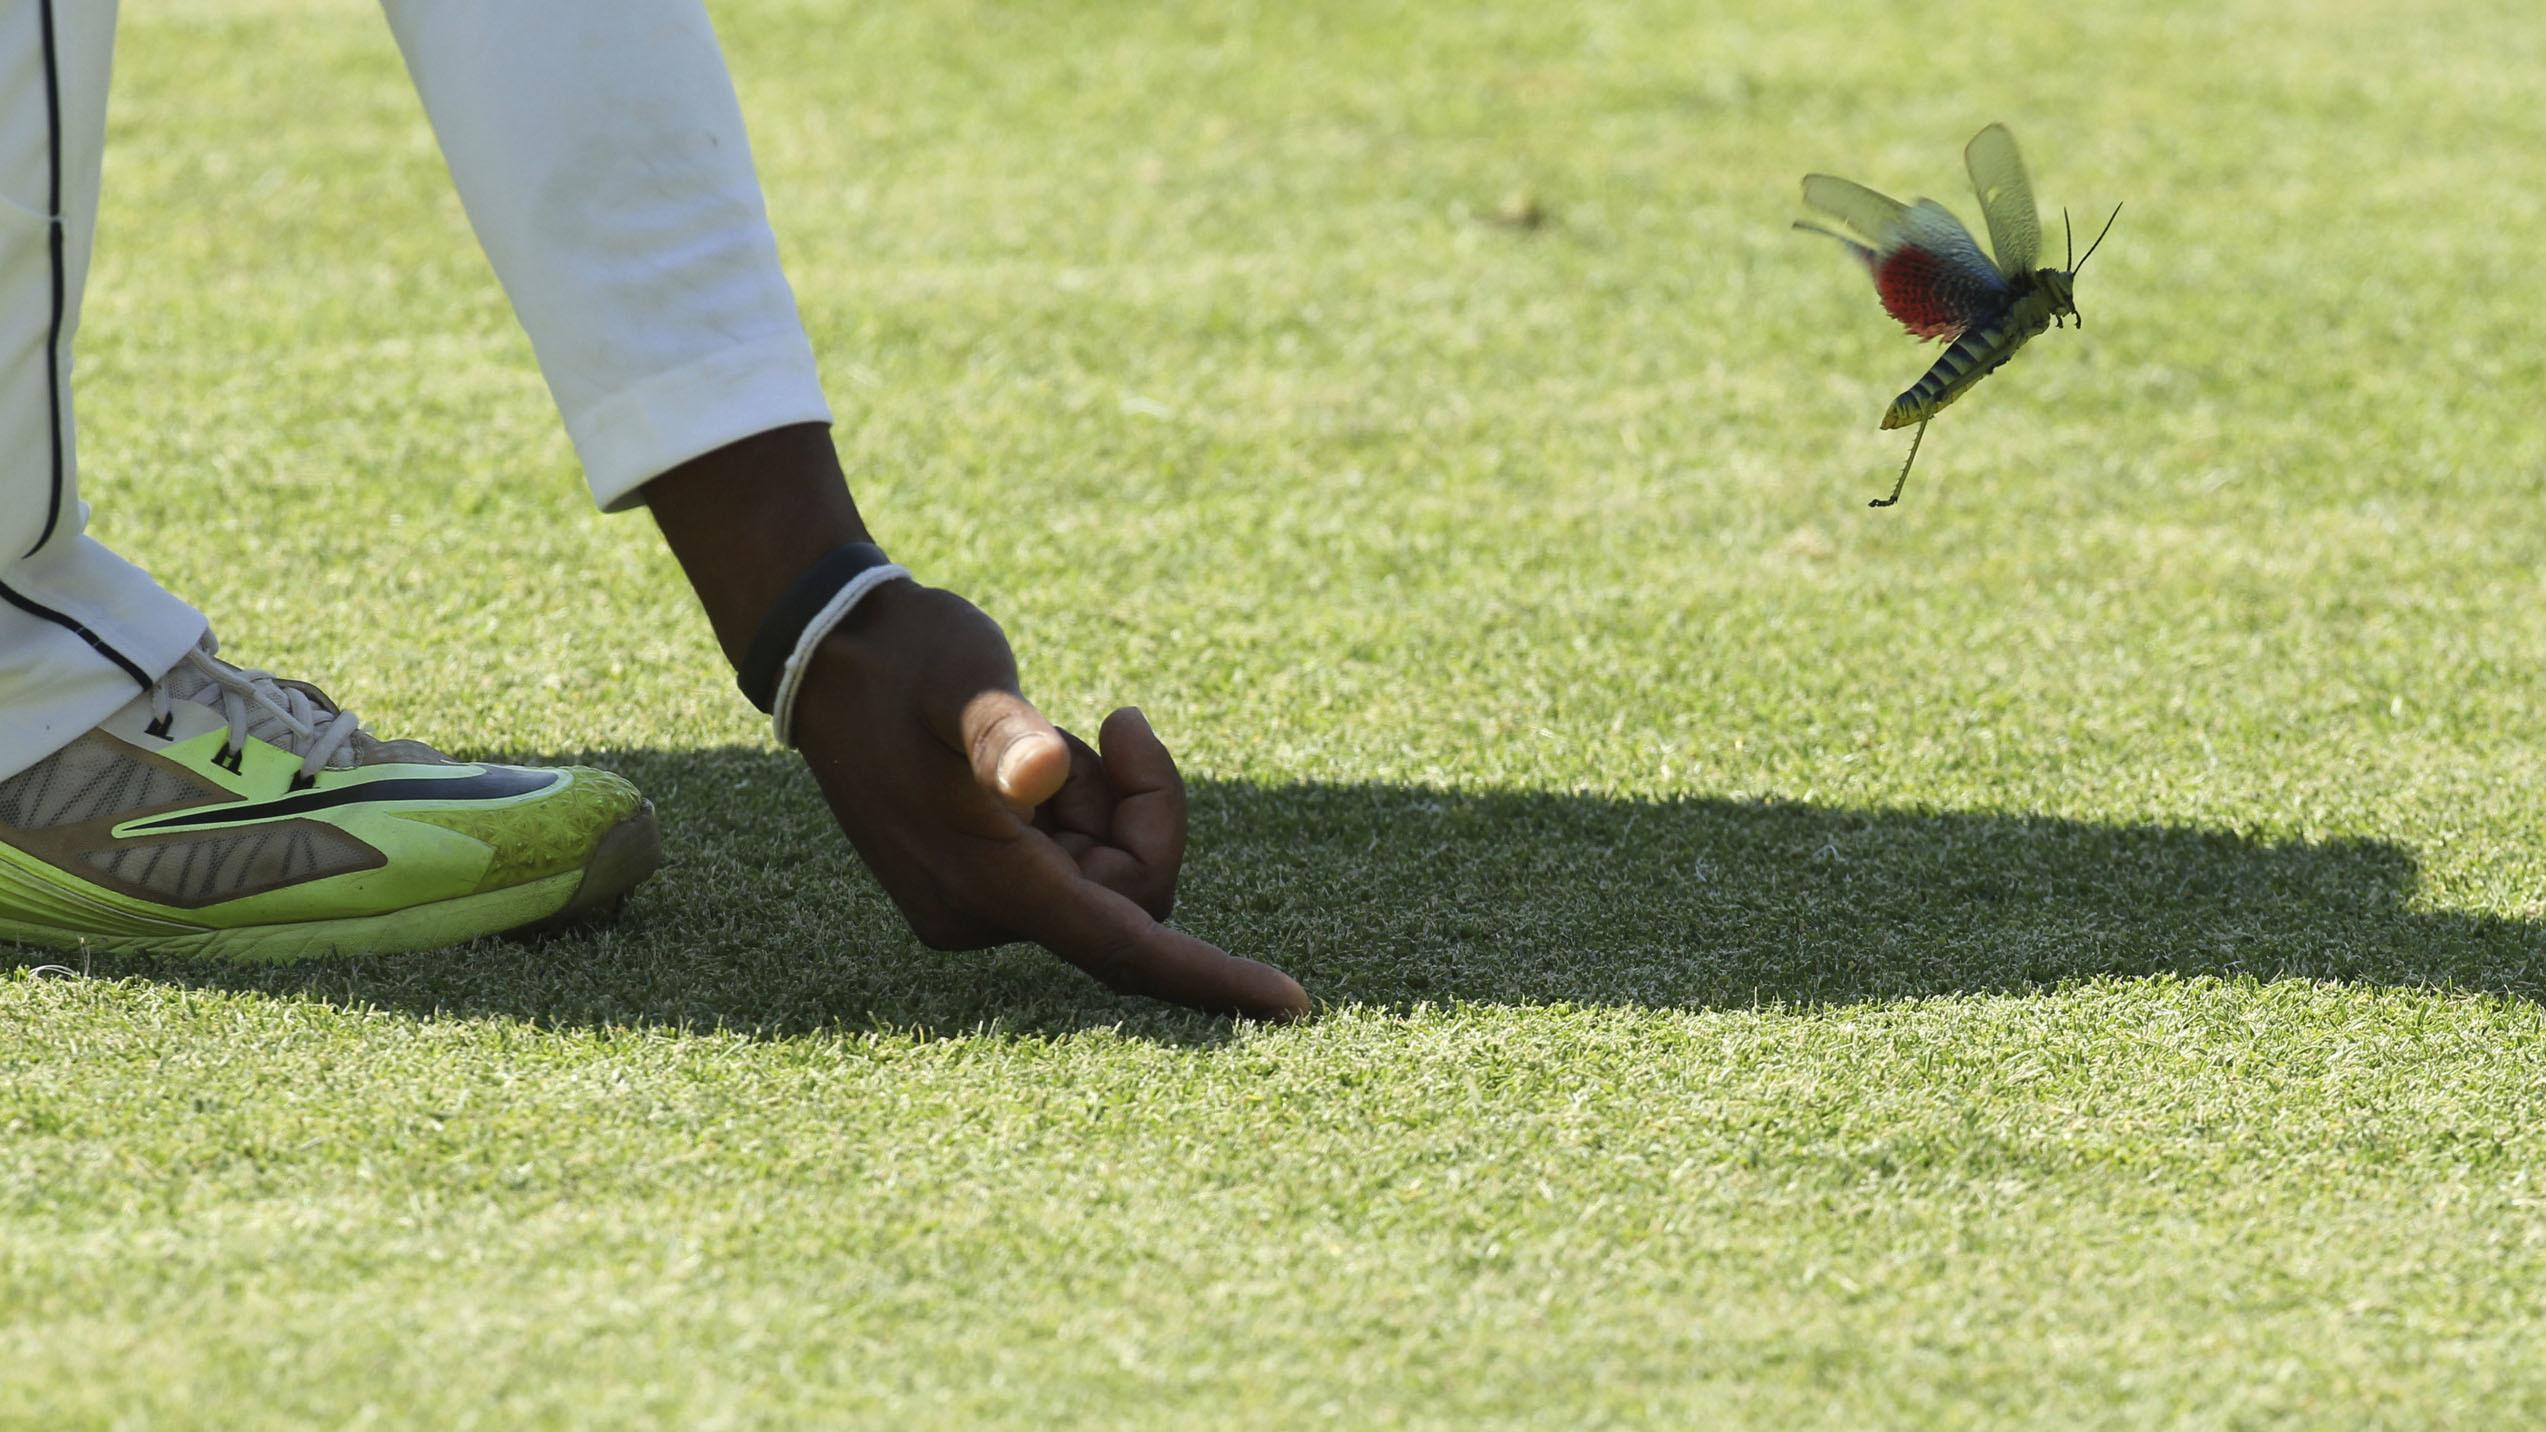 Sri Lanka player Dilrwuan Perera prompts a flying insect off the pitch during the test cricket match against Zimbabwe at Harare Sports Club in Harare, Monday Oct. 31, 2016. Zimbabwe is playing its 100th test cricket match as it plays host to Sri Lanka in Zimbabwe. (AP Photo/Tsvangirayi Mukwazhi)